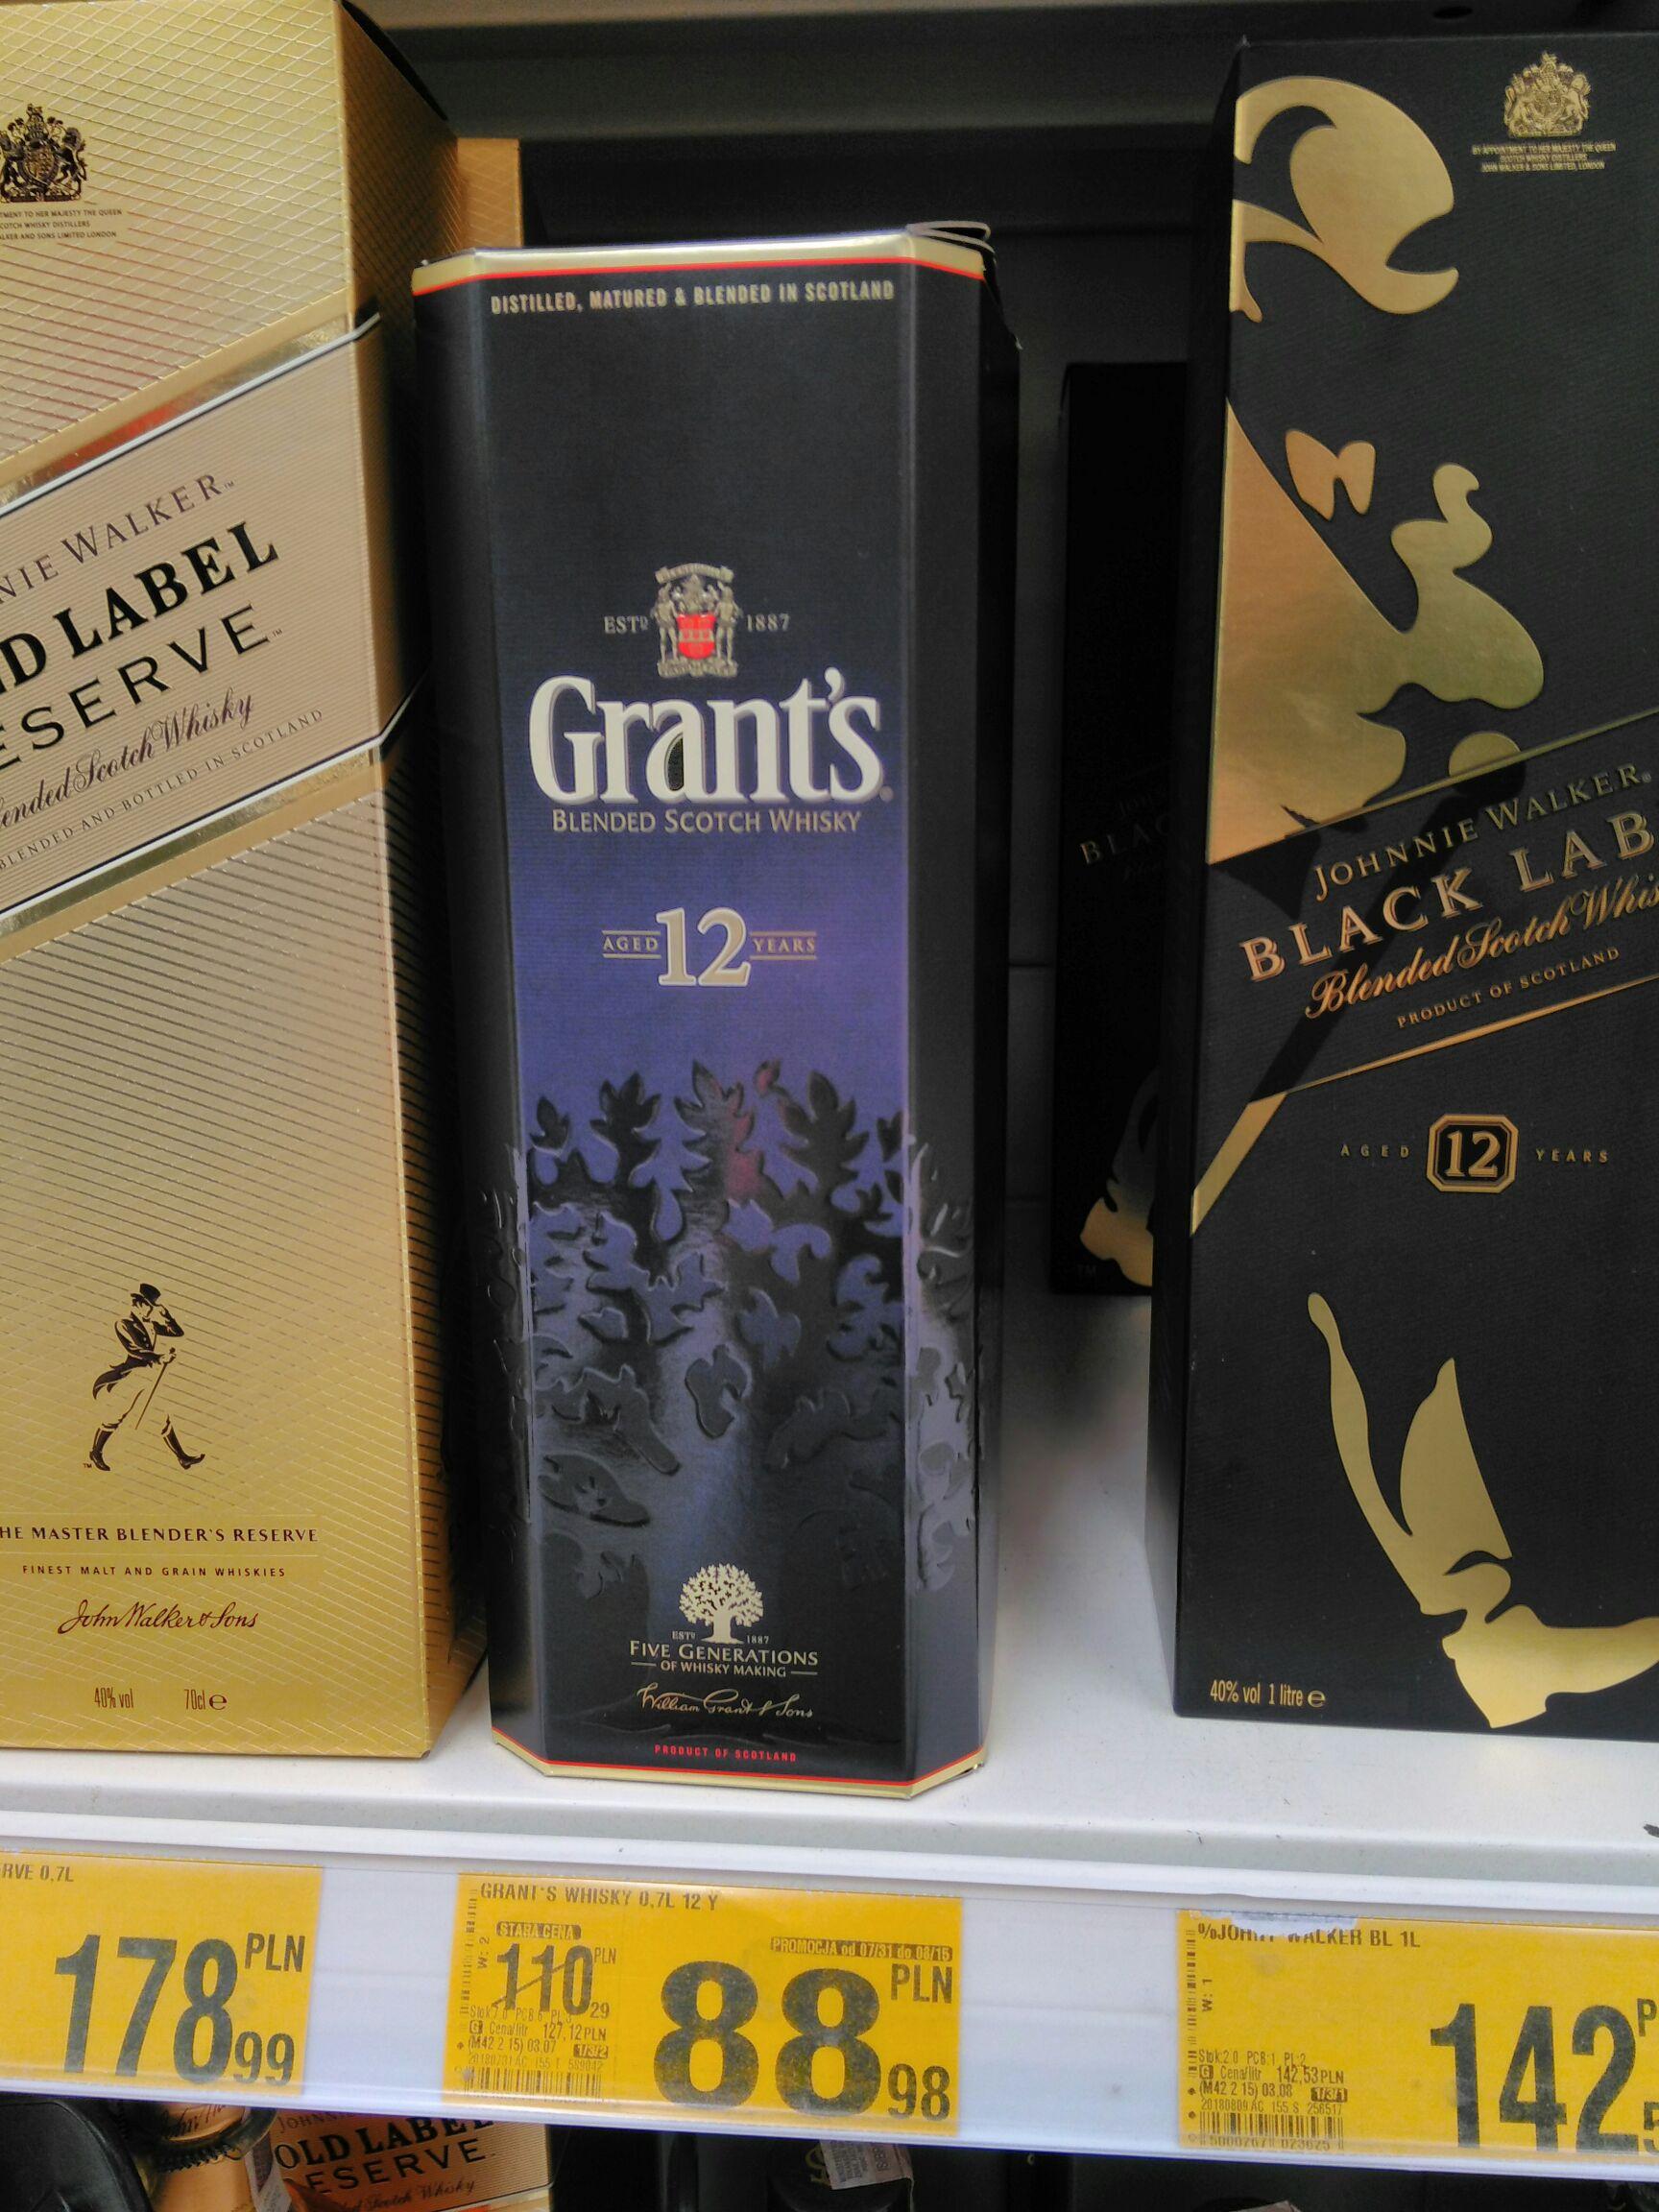 Grants whisky 0,7 l, 12 letnia w Auchan za 88,98 zl